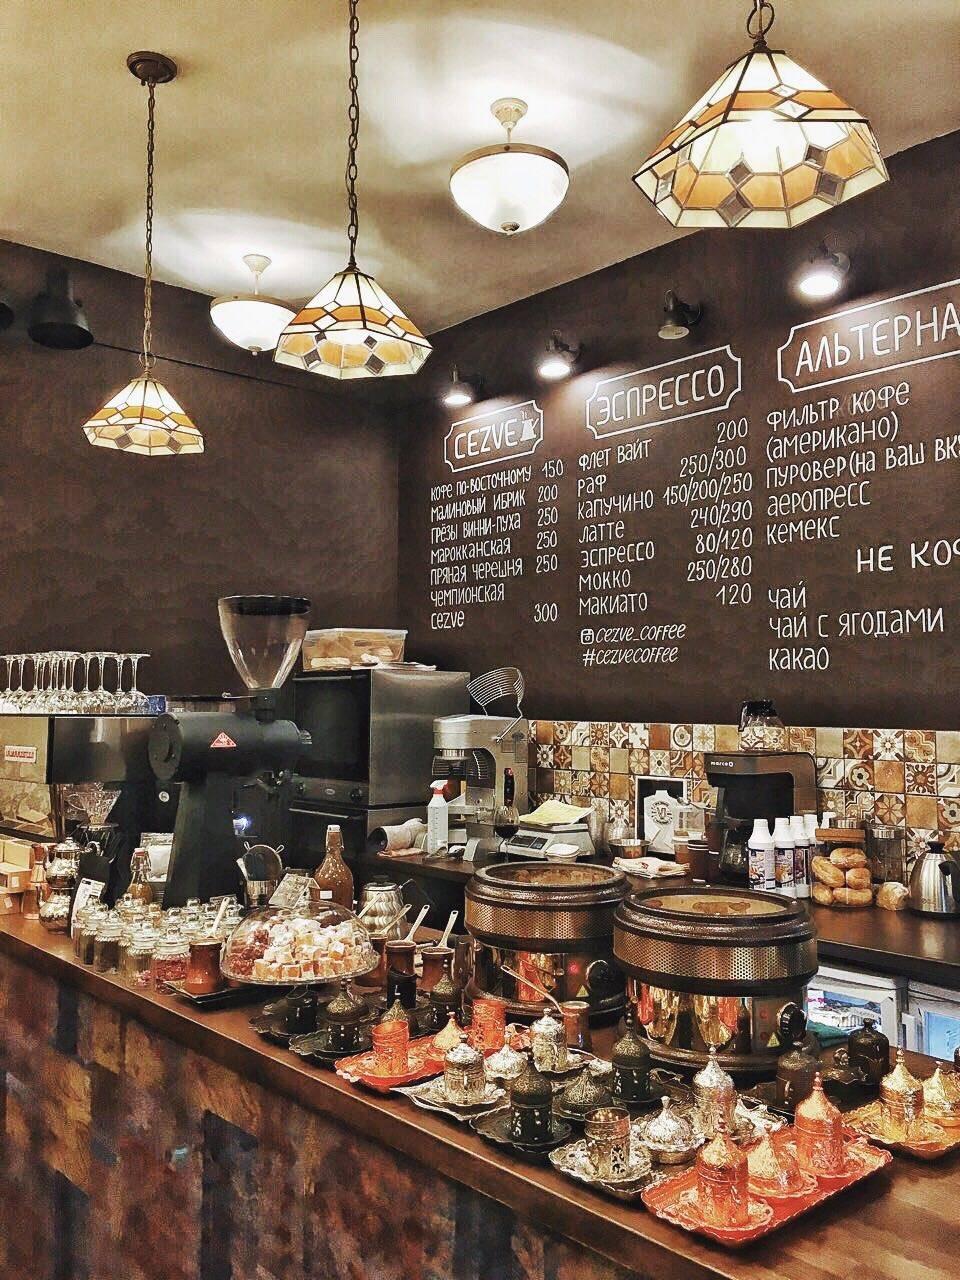 Кофейня Cezve coffee - культура спешелти кофе в турке